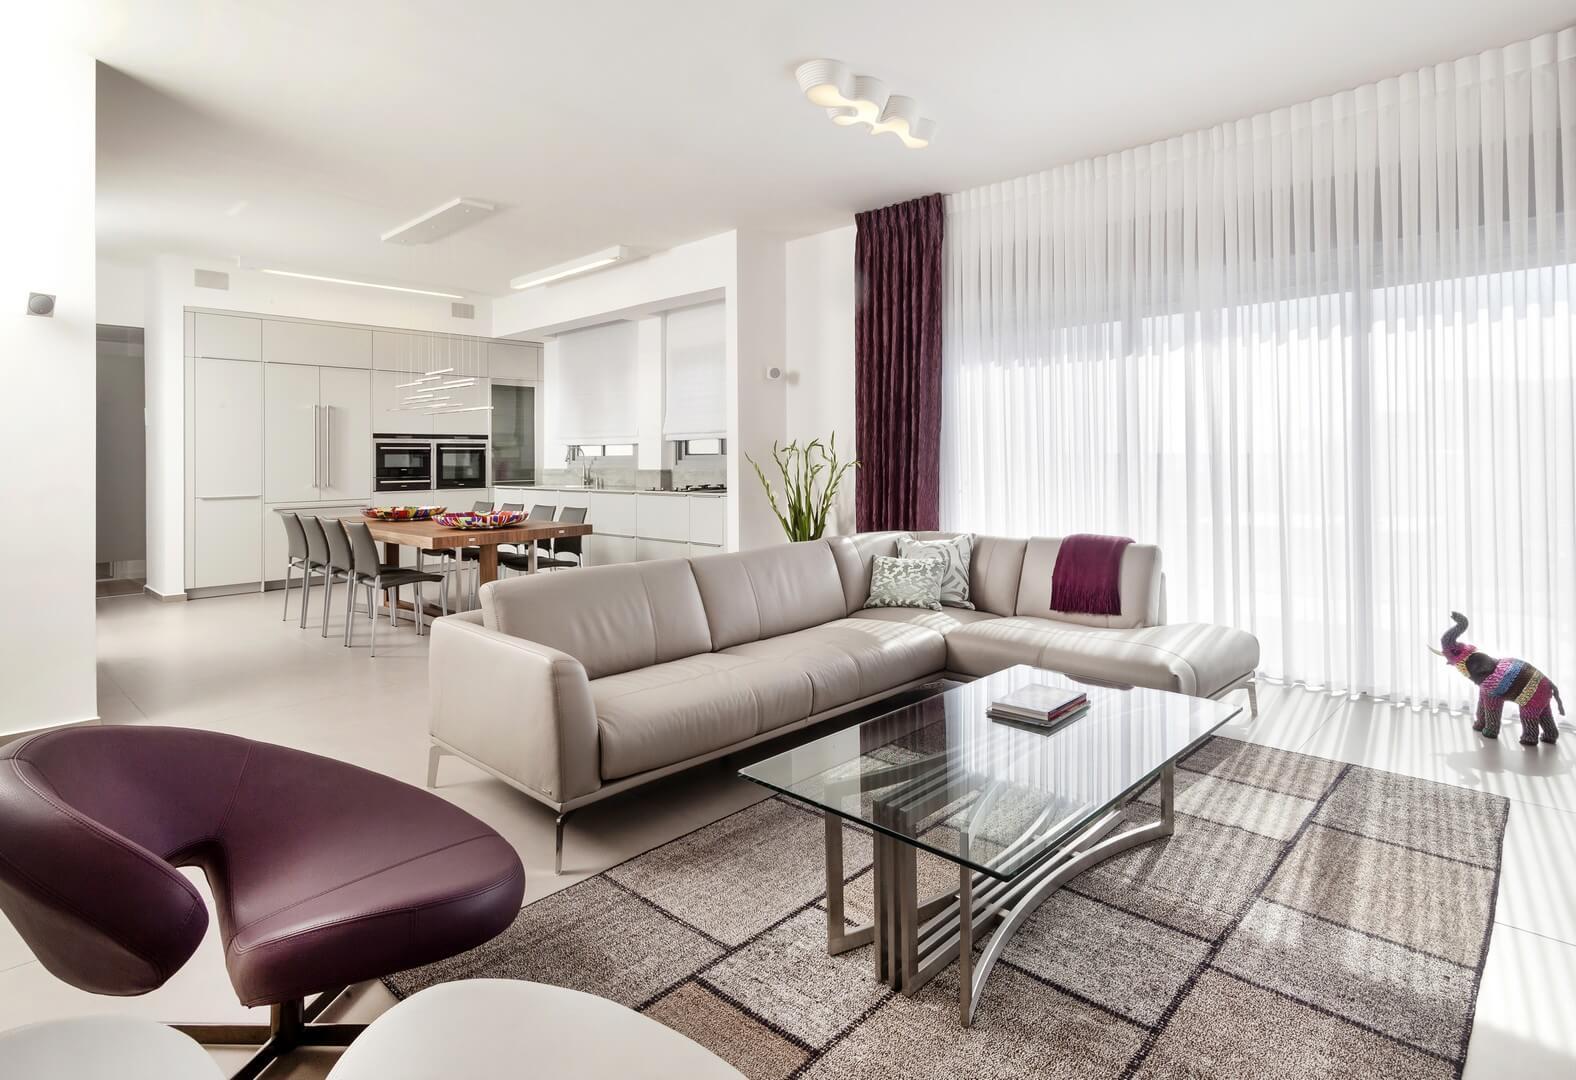 Interior designer Etty Hezroni